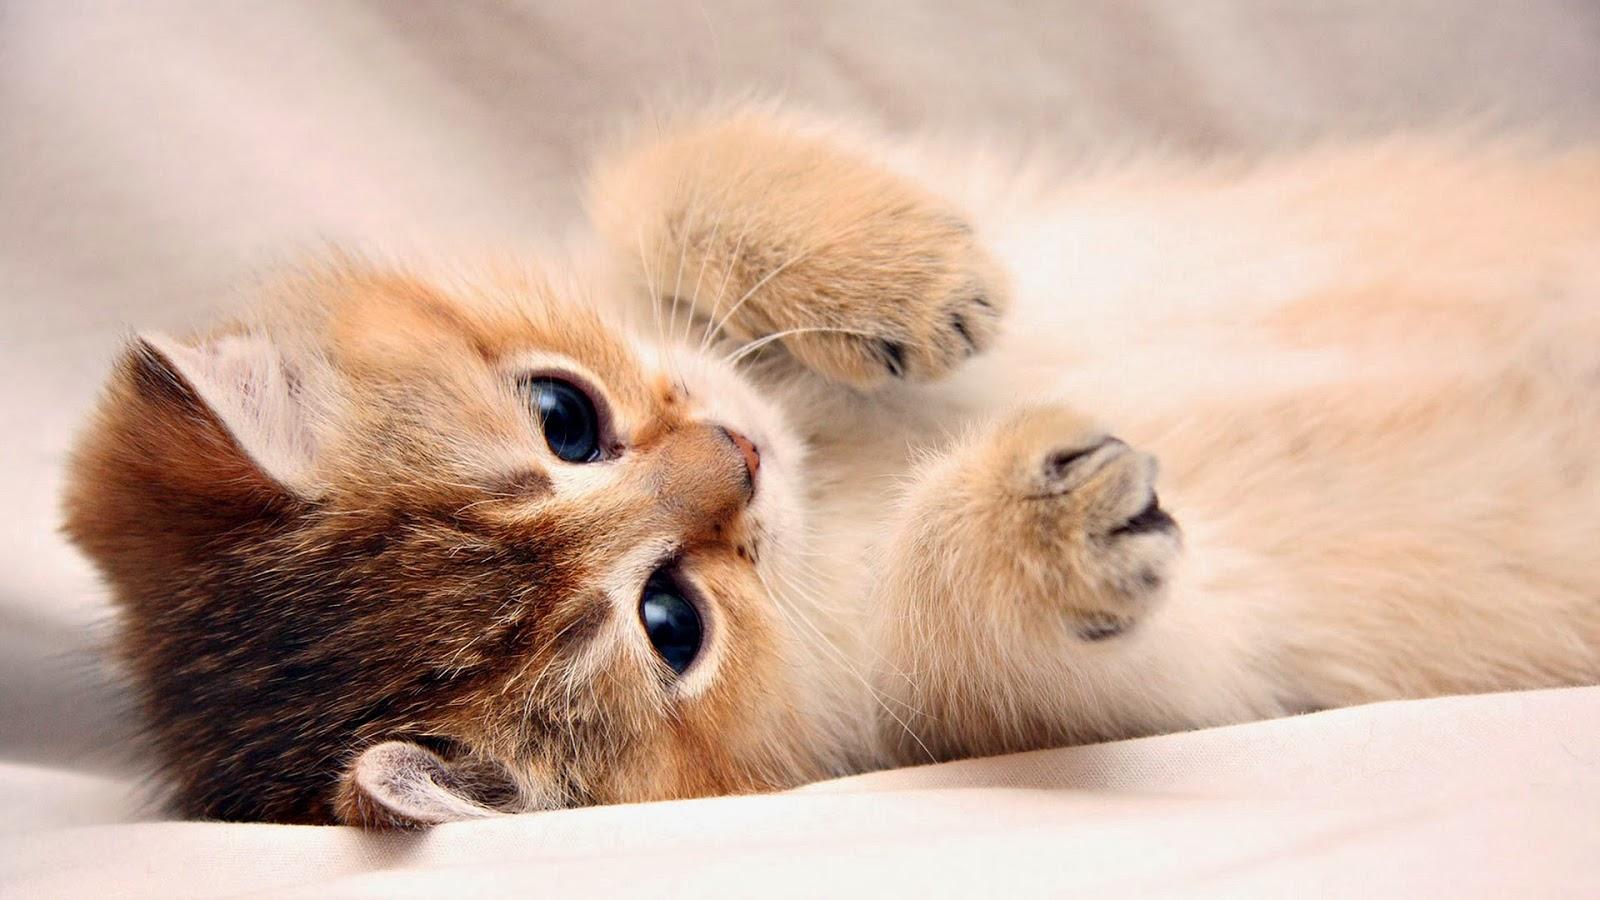 Hd wallpapers free high definition desktop backgrounds - Cute kitten backgrounds for desktop ...